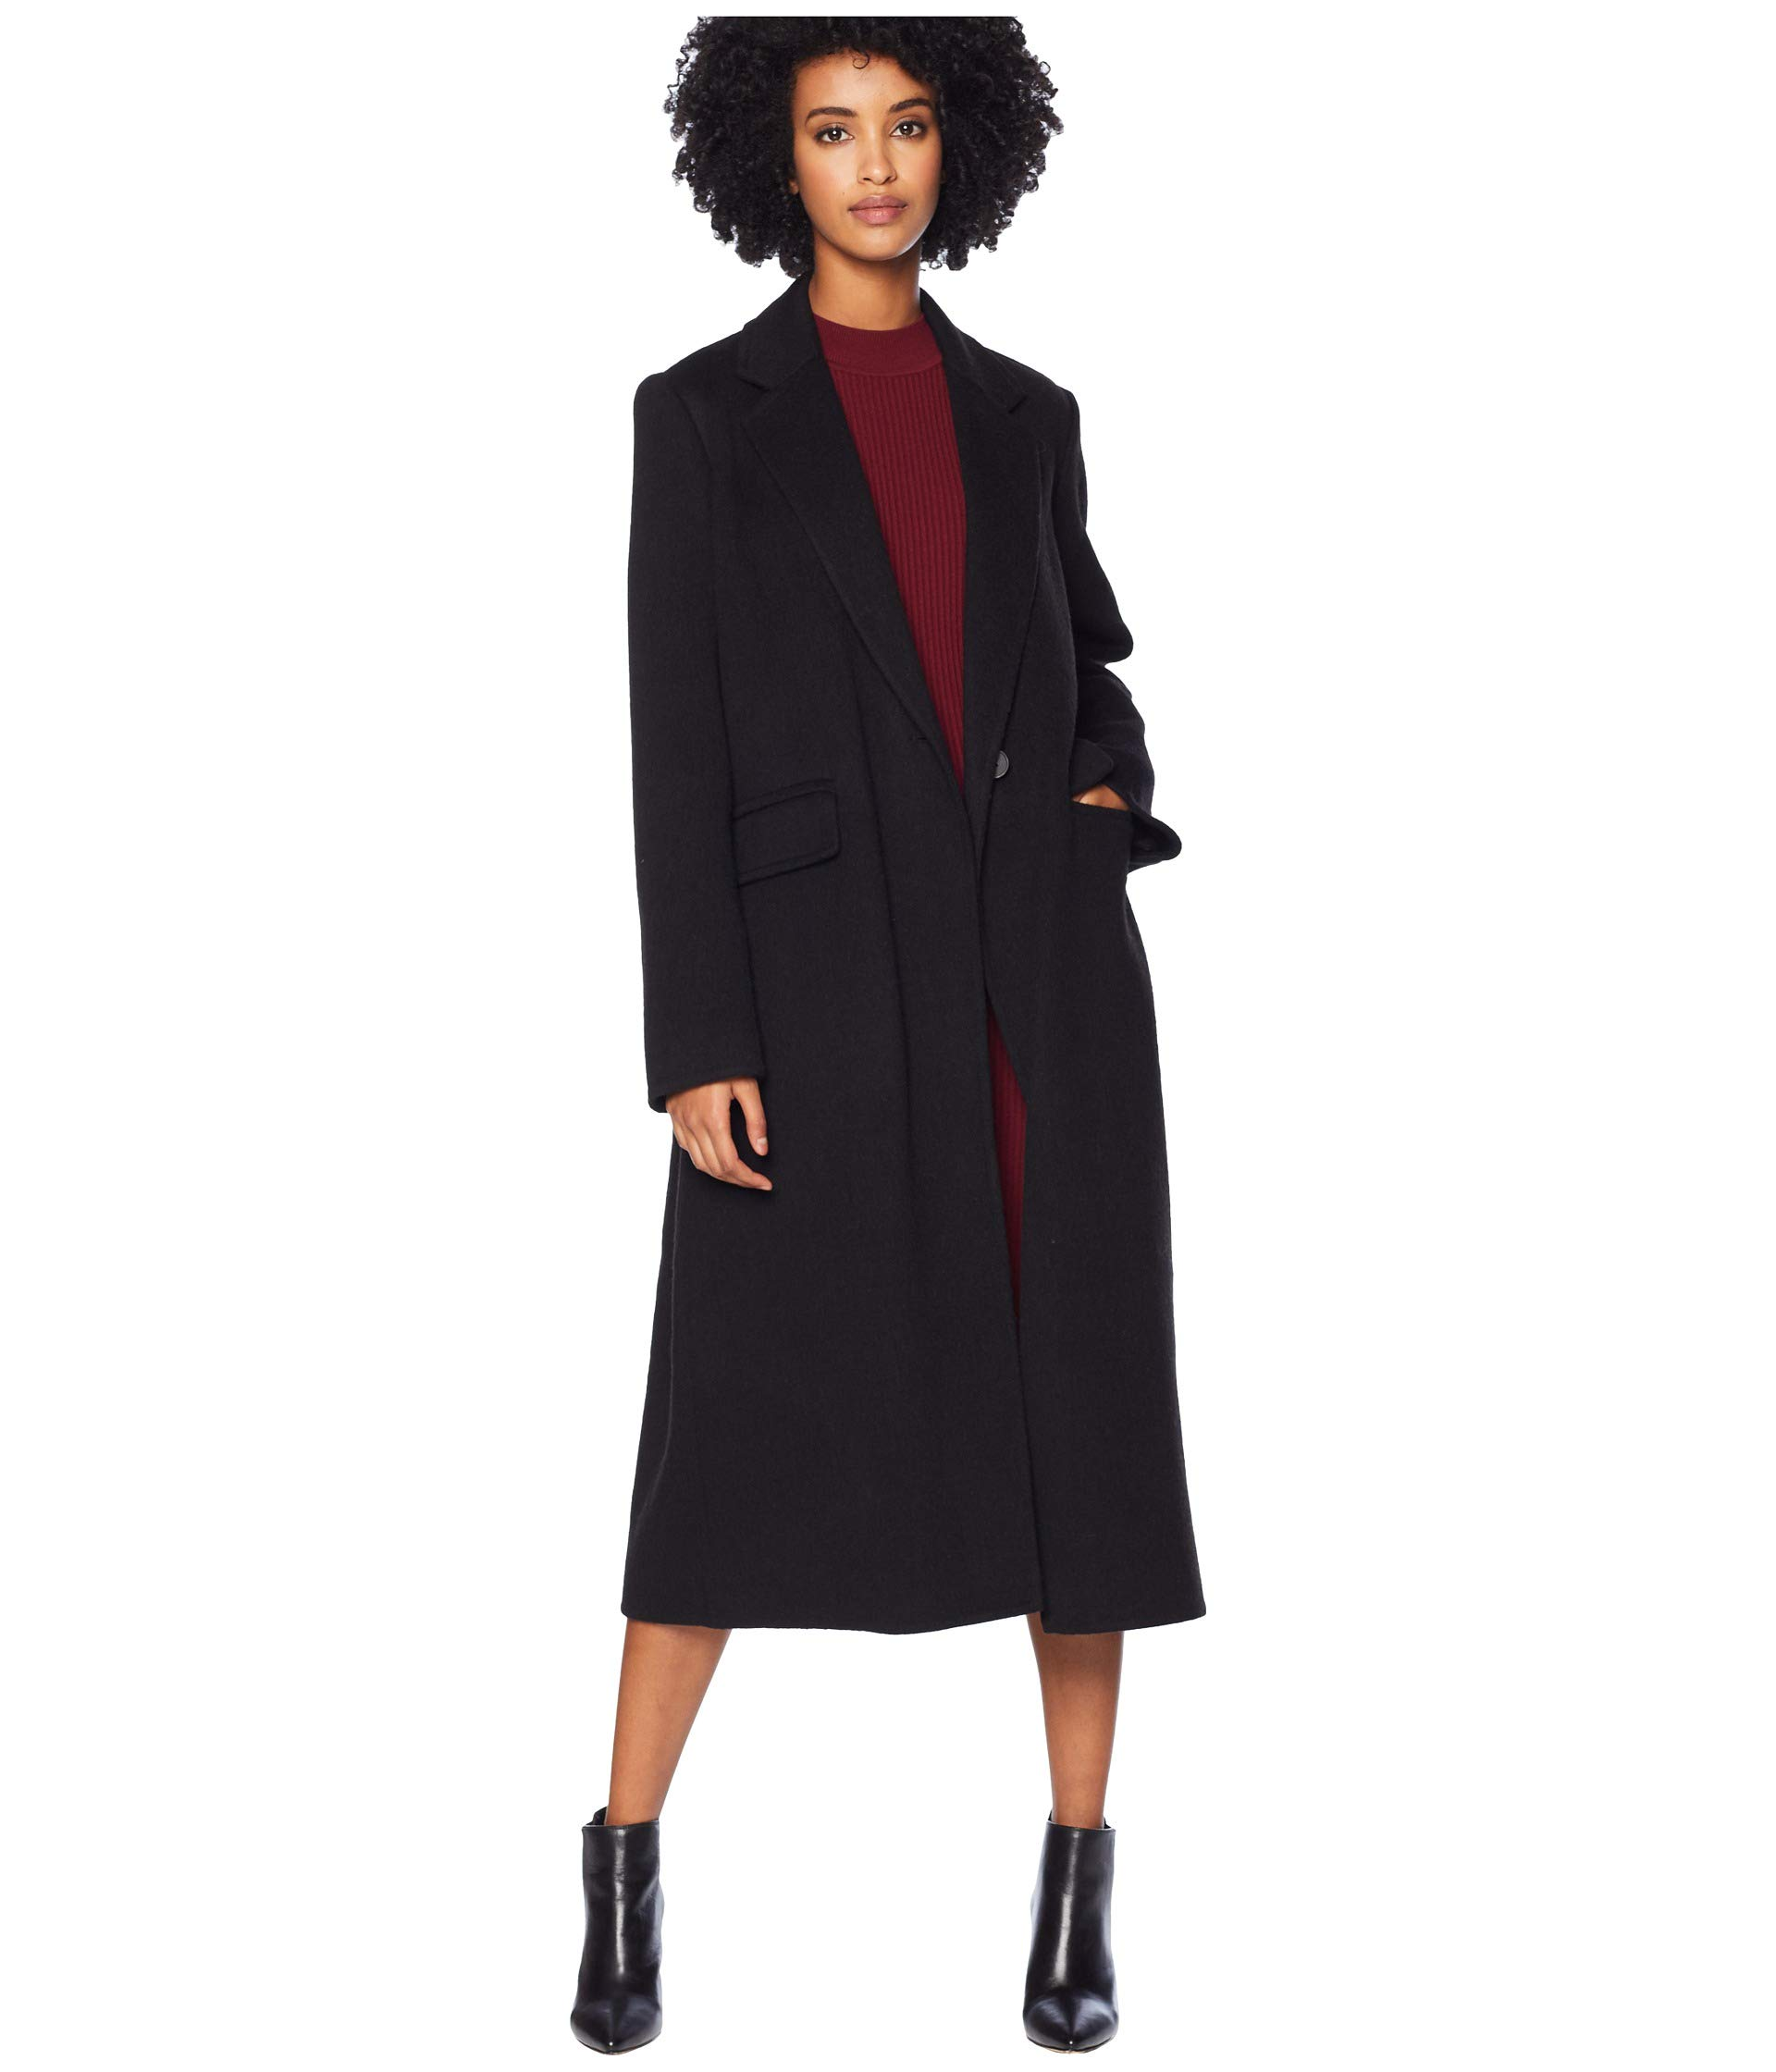 Long Vince Vince Coat Coat Long Black Vince Black Egq15Hn